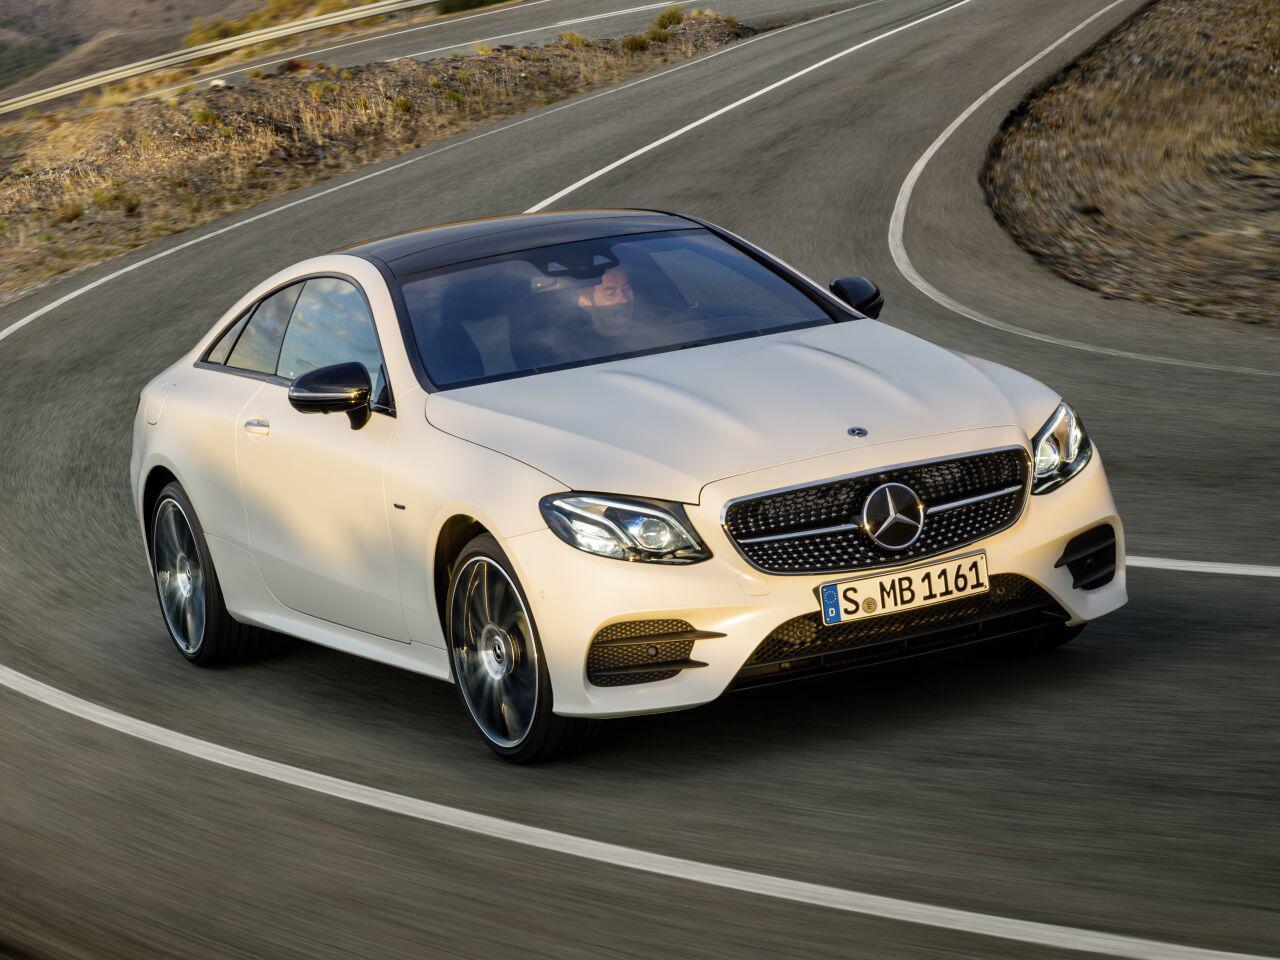 Bild zu Sportwagen: Mercedes-Benz E-Klasse Coupé